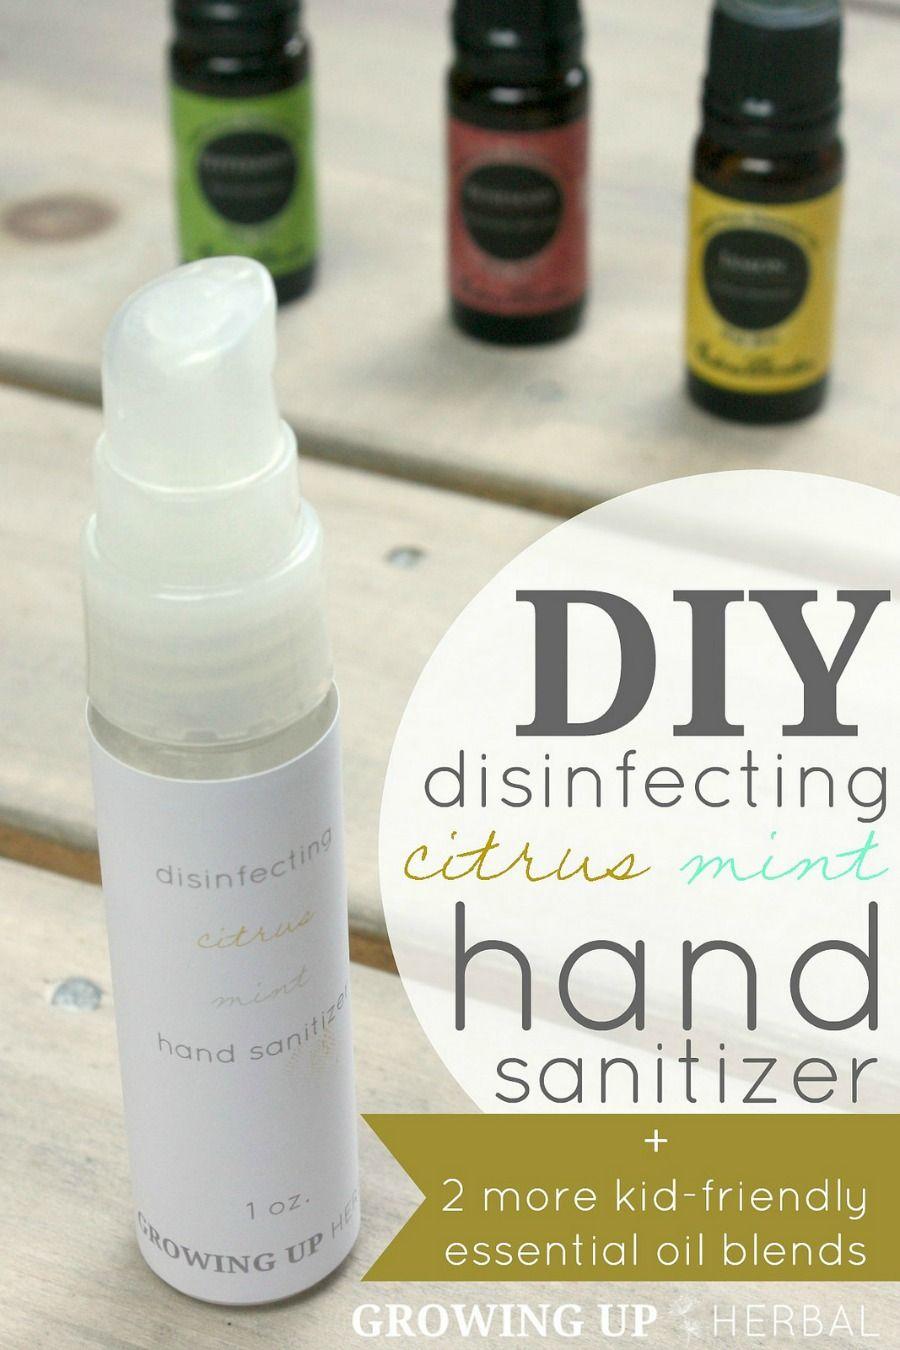 DIY Disinfecting Citrus Mint Hand Sanitizer + 2 More Kid